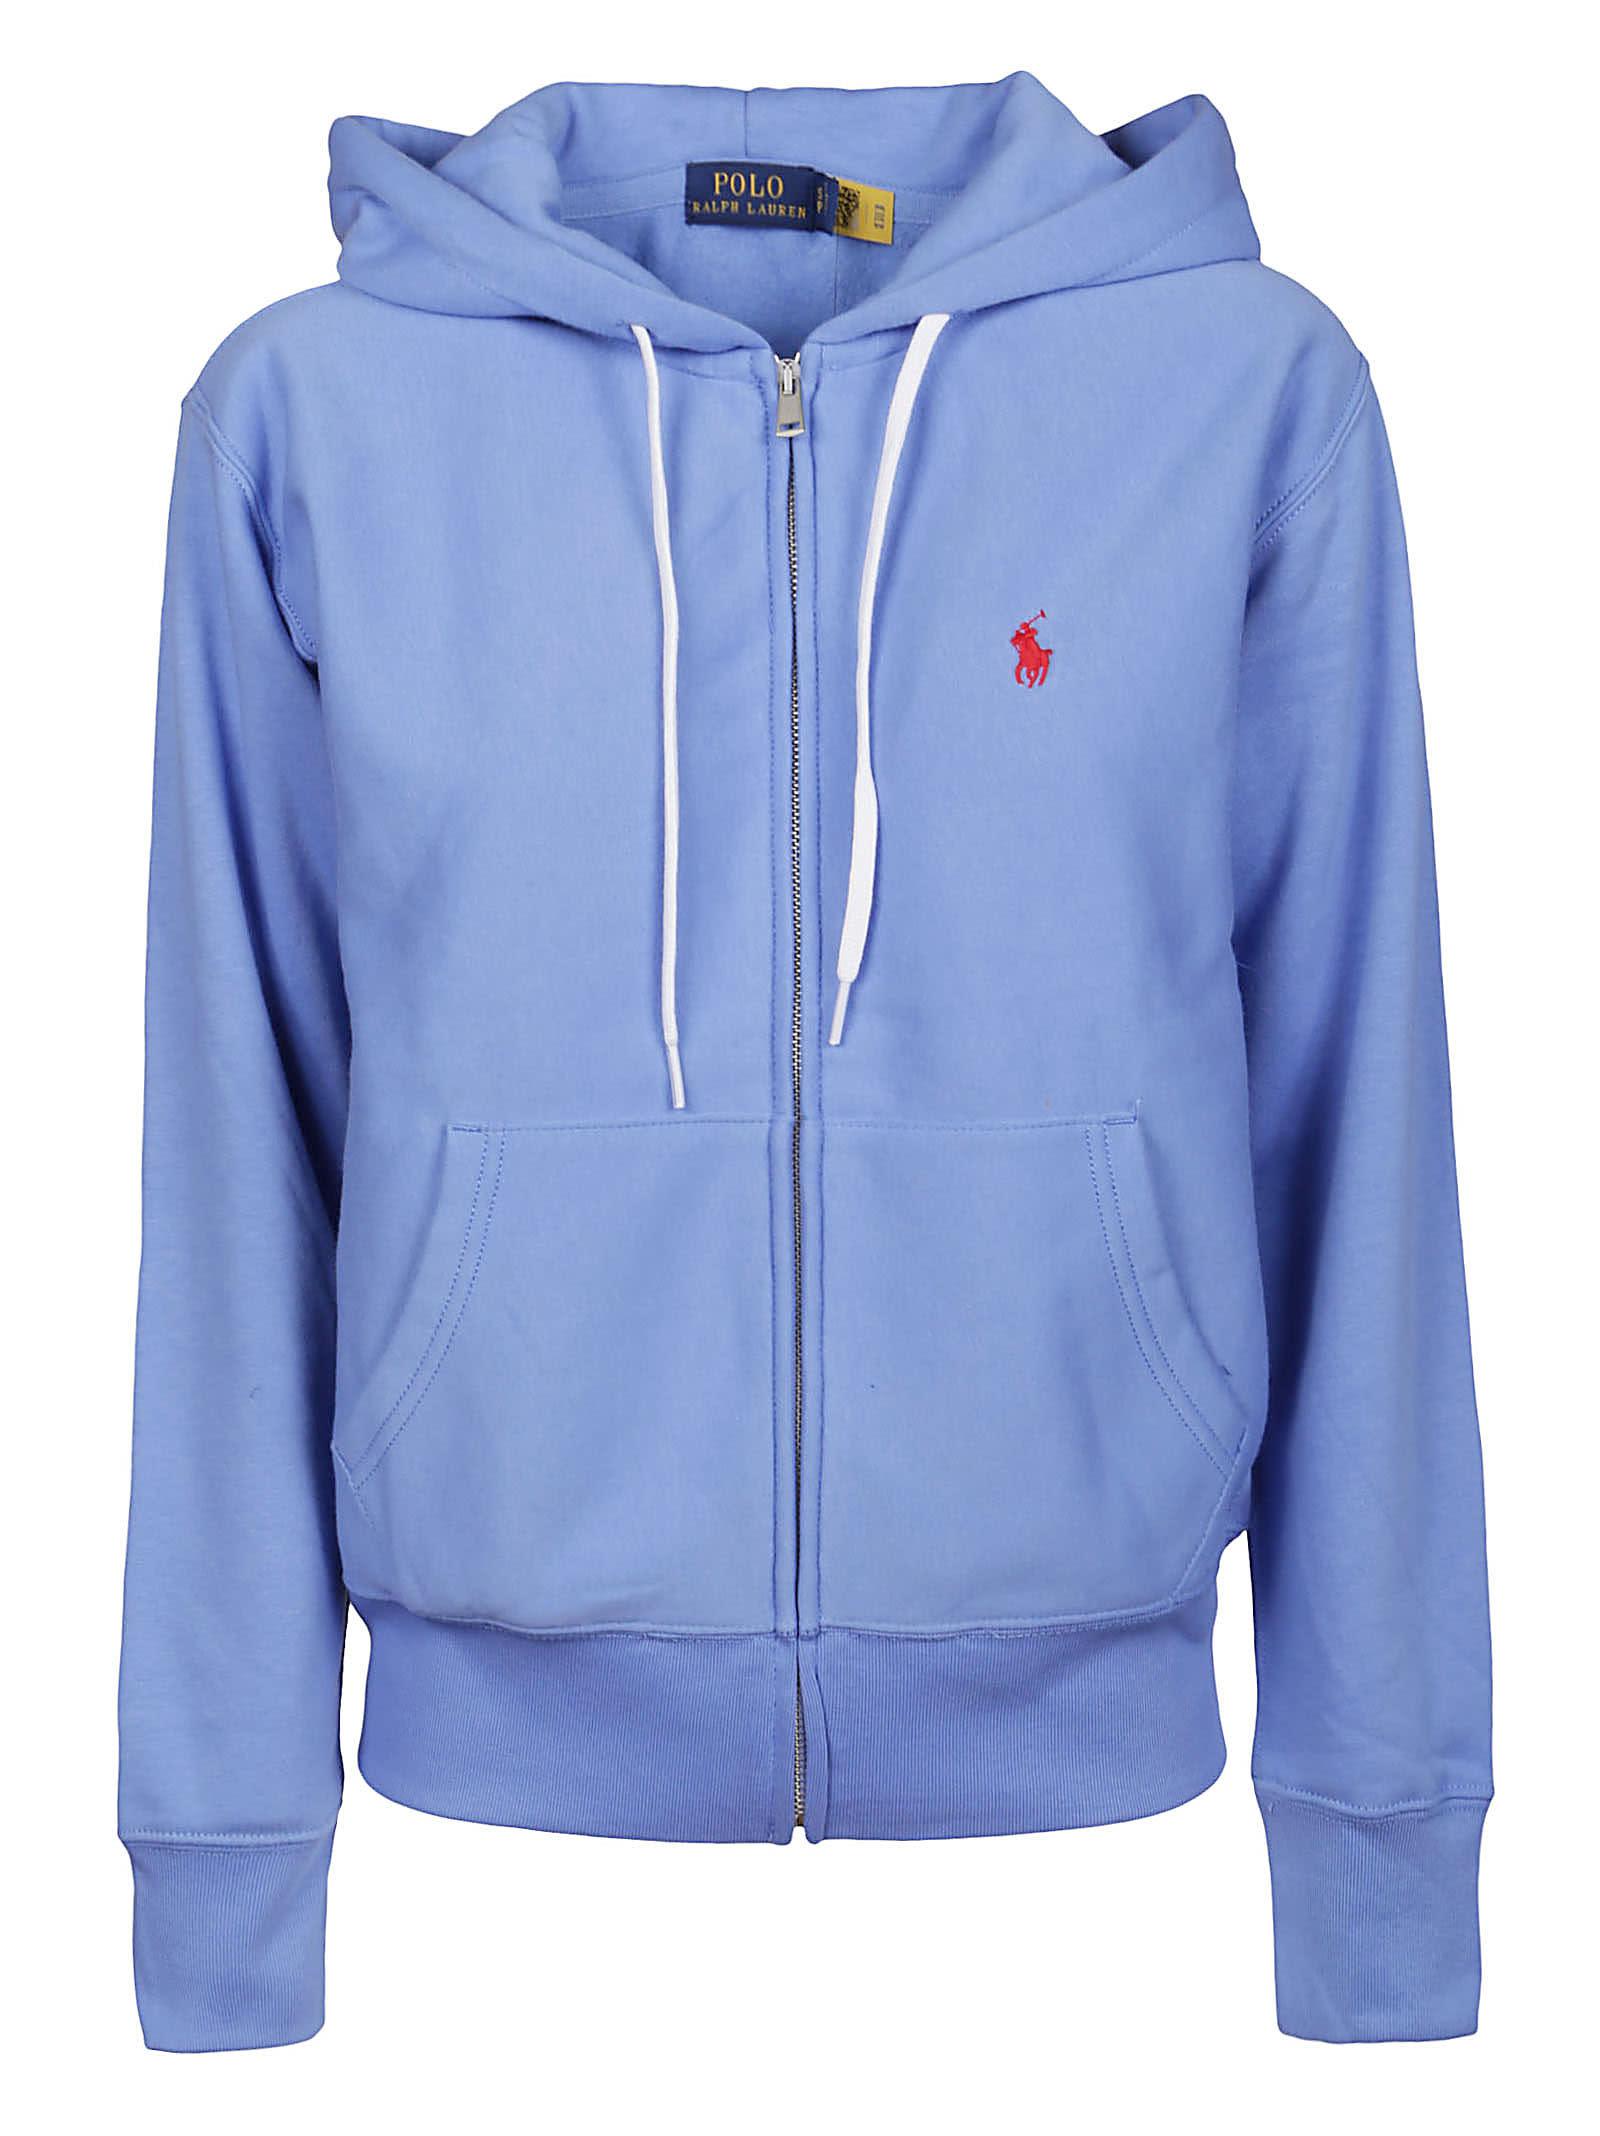 Polo Ralph Lauren Clothing LIGHT BLUE COTTON SWEATSHIRT